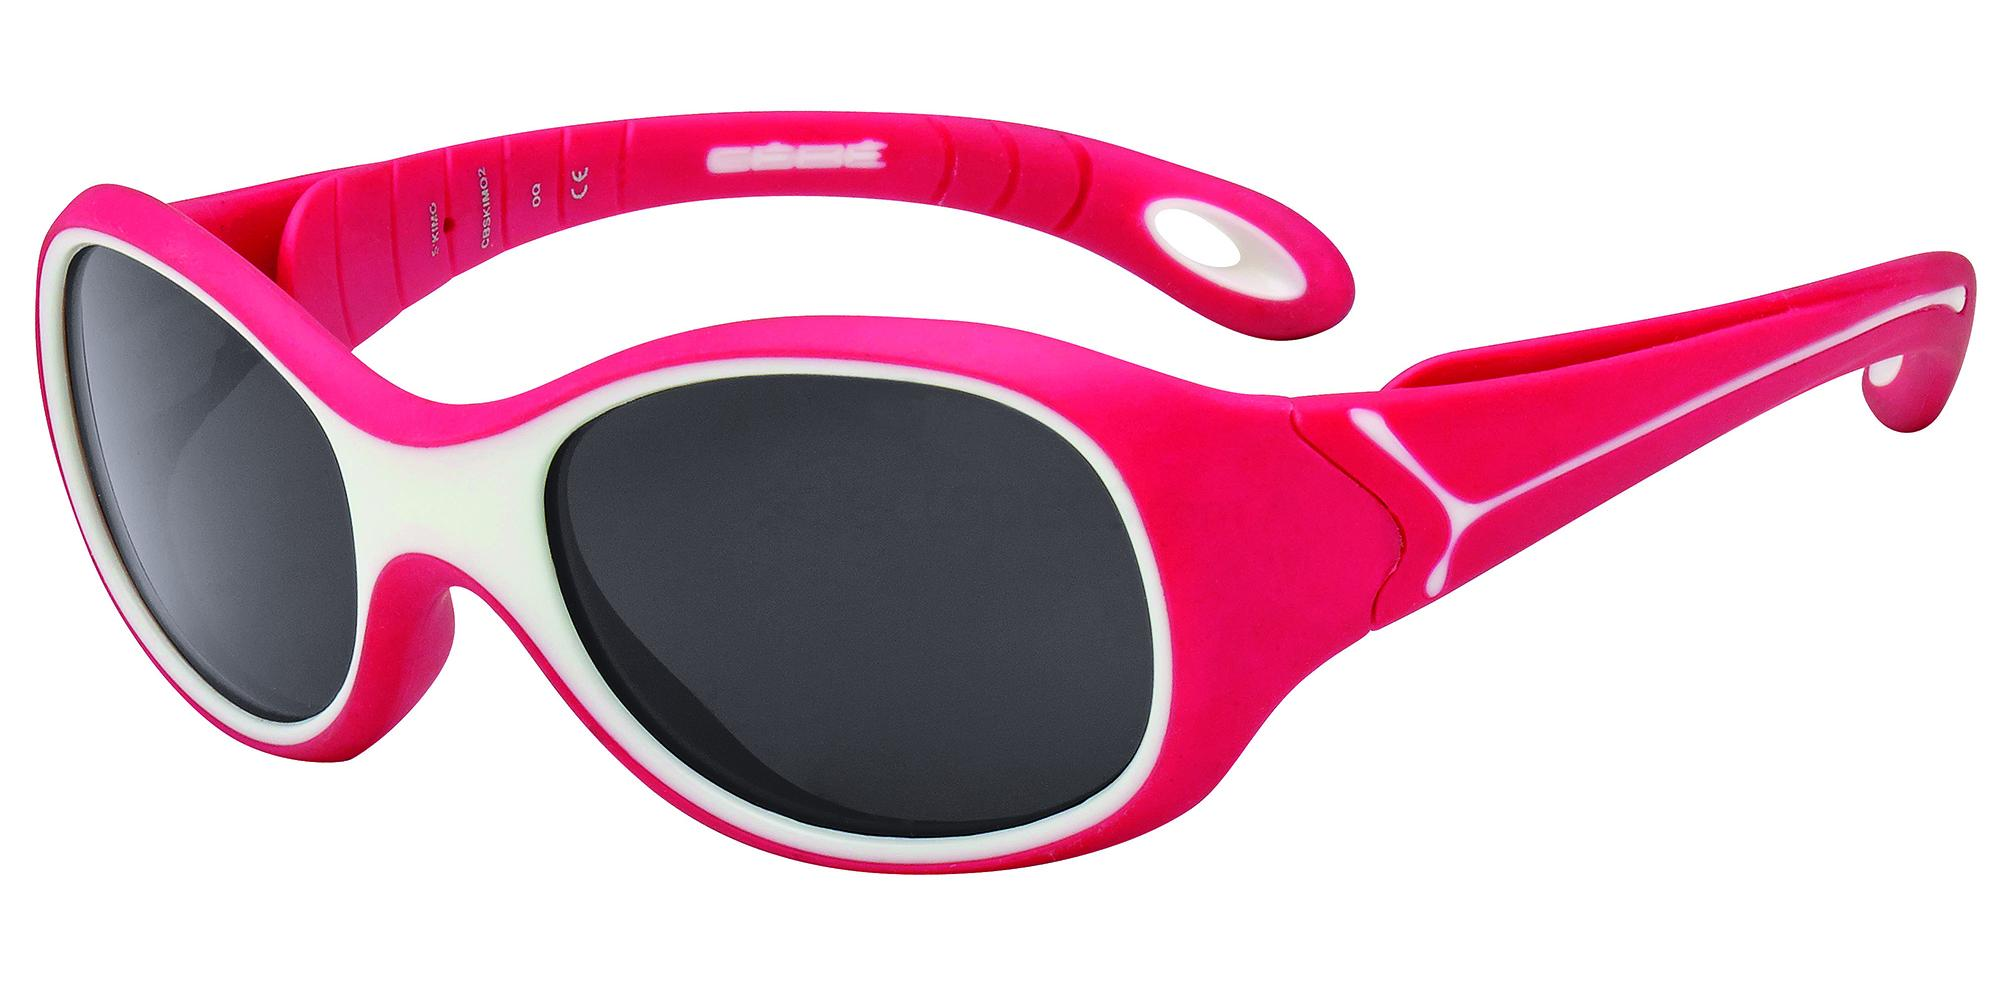 CBSKIMO10 S'Kimo (Age 1-3) Sunglasses, Cebe JUNIOR